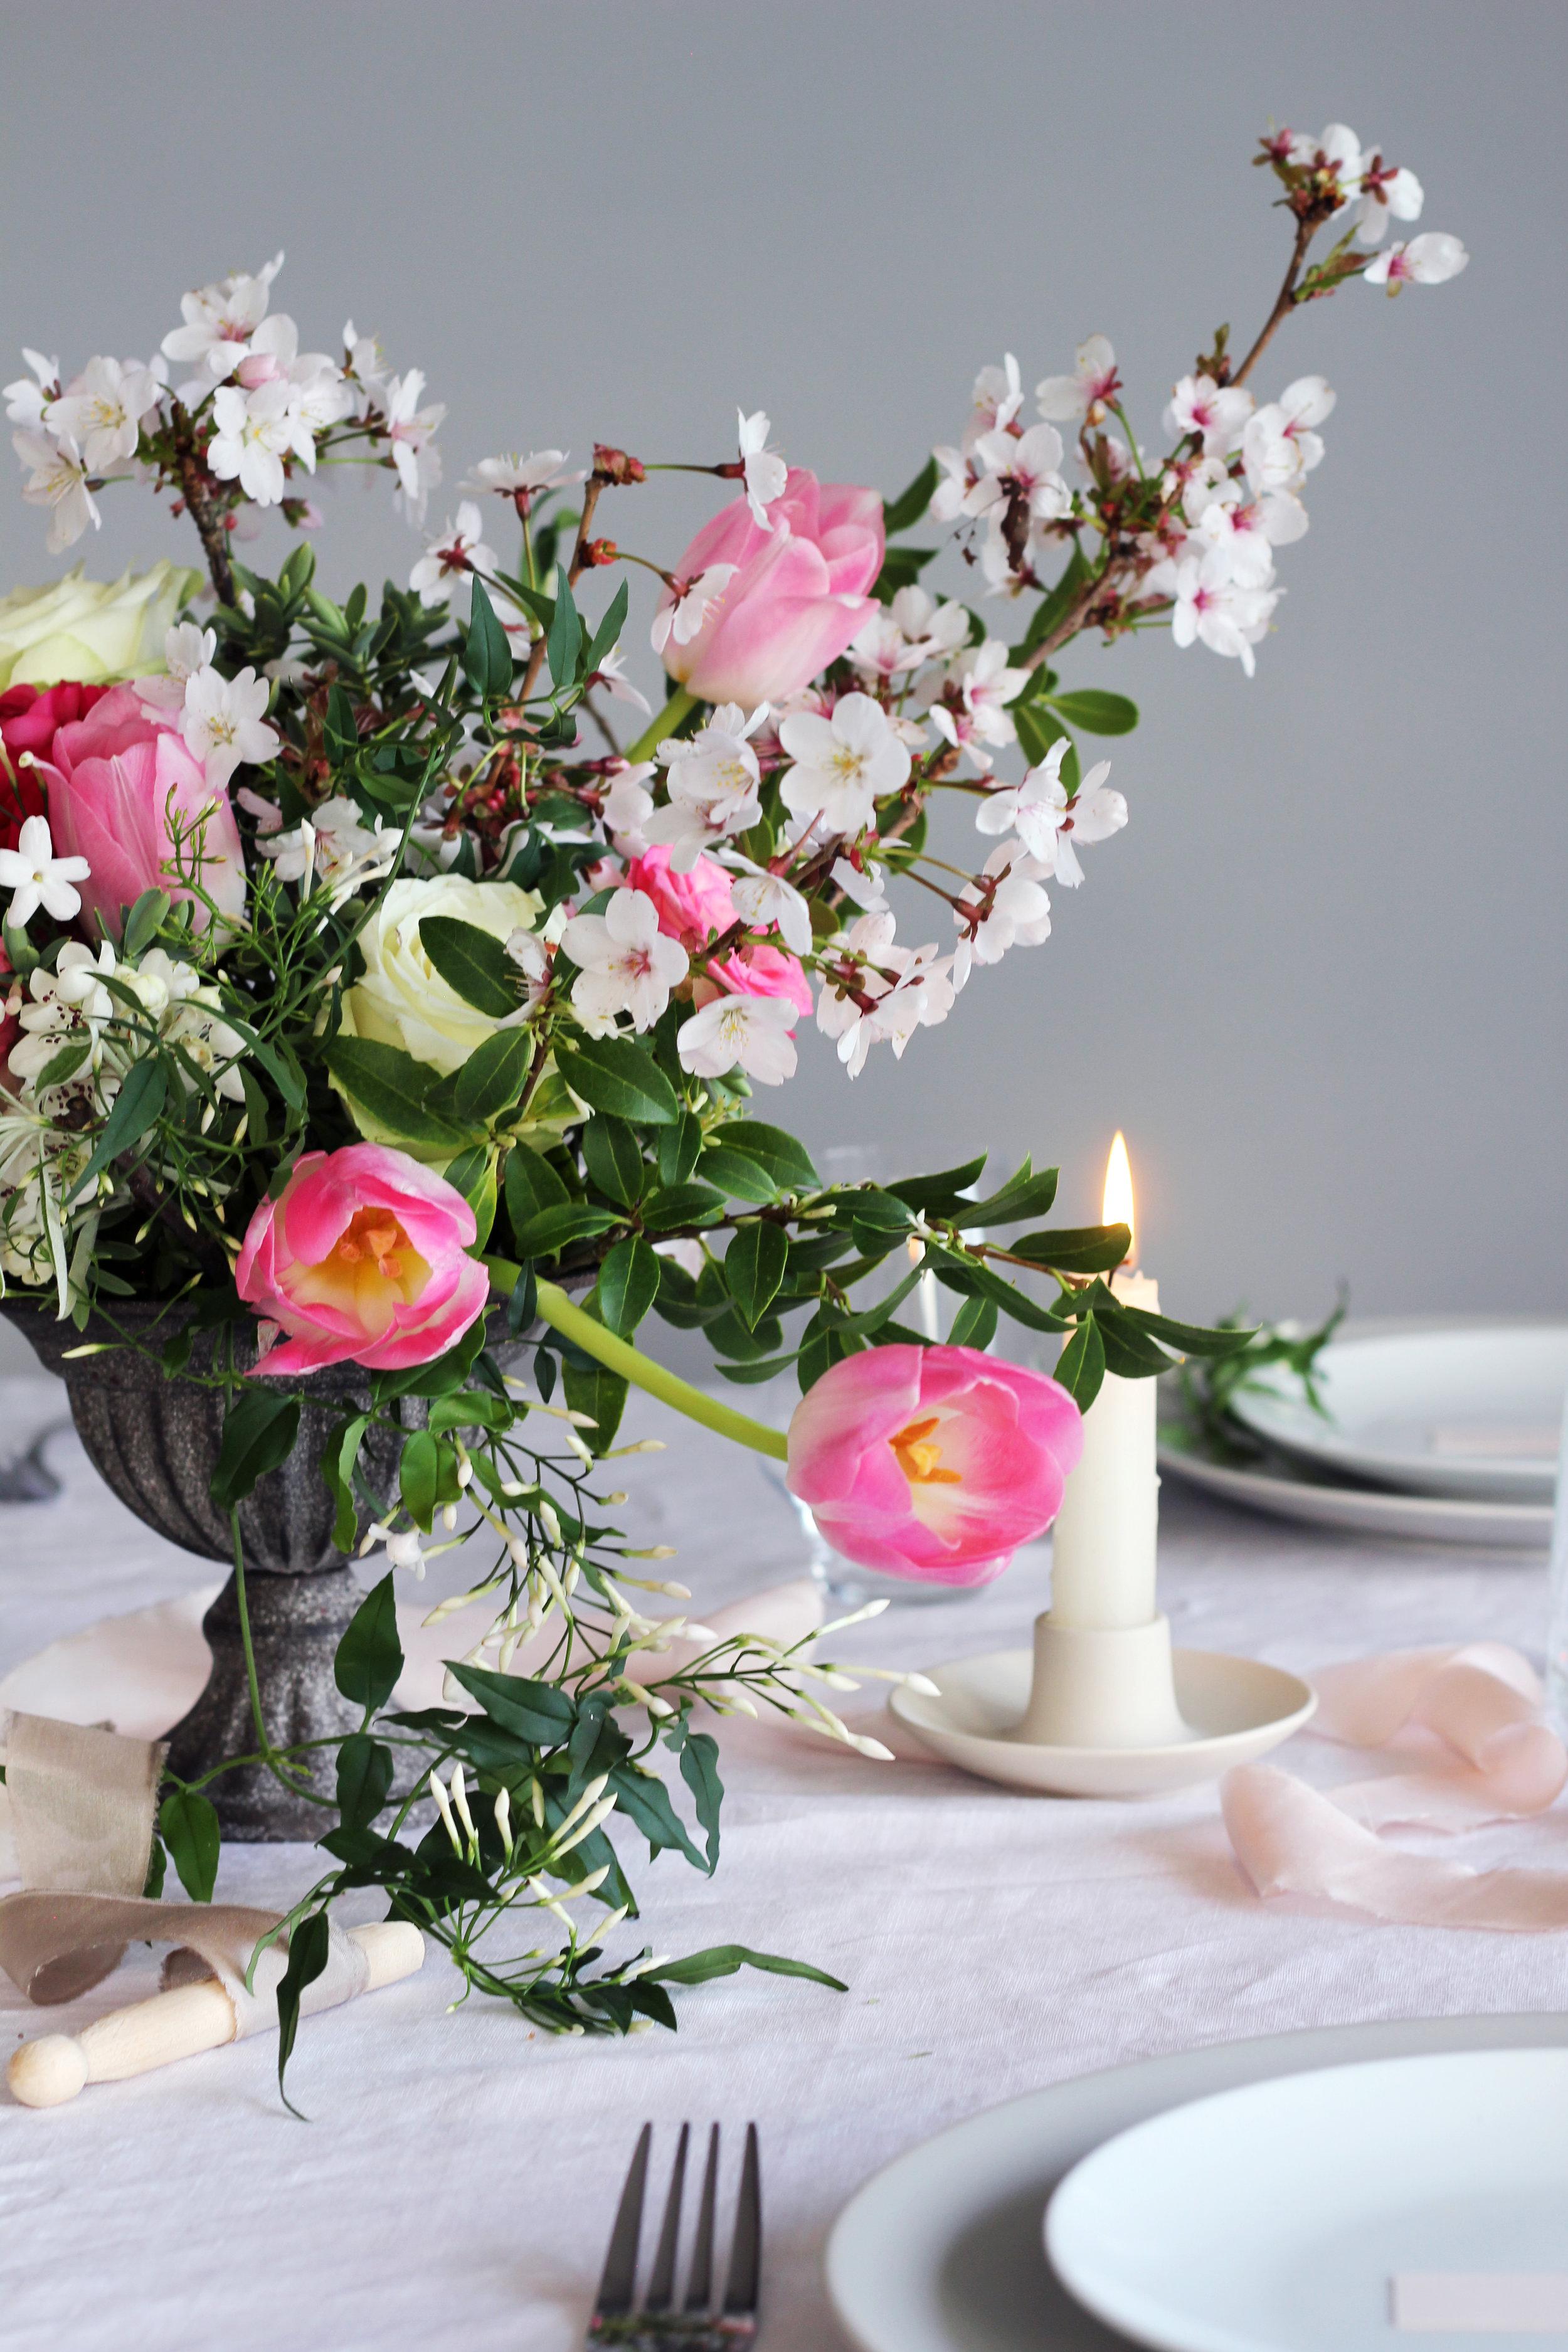 Callie-Pettigrew-Springtime-Wedding-10.jpg